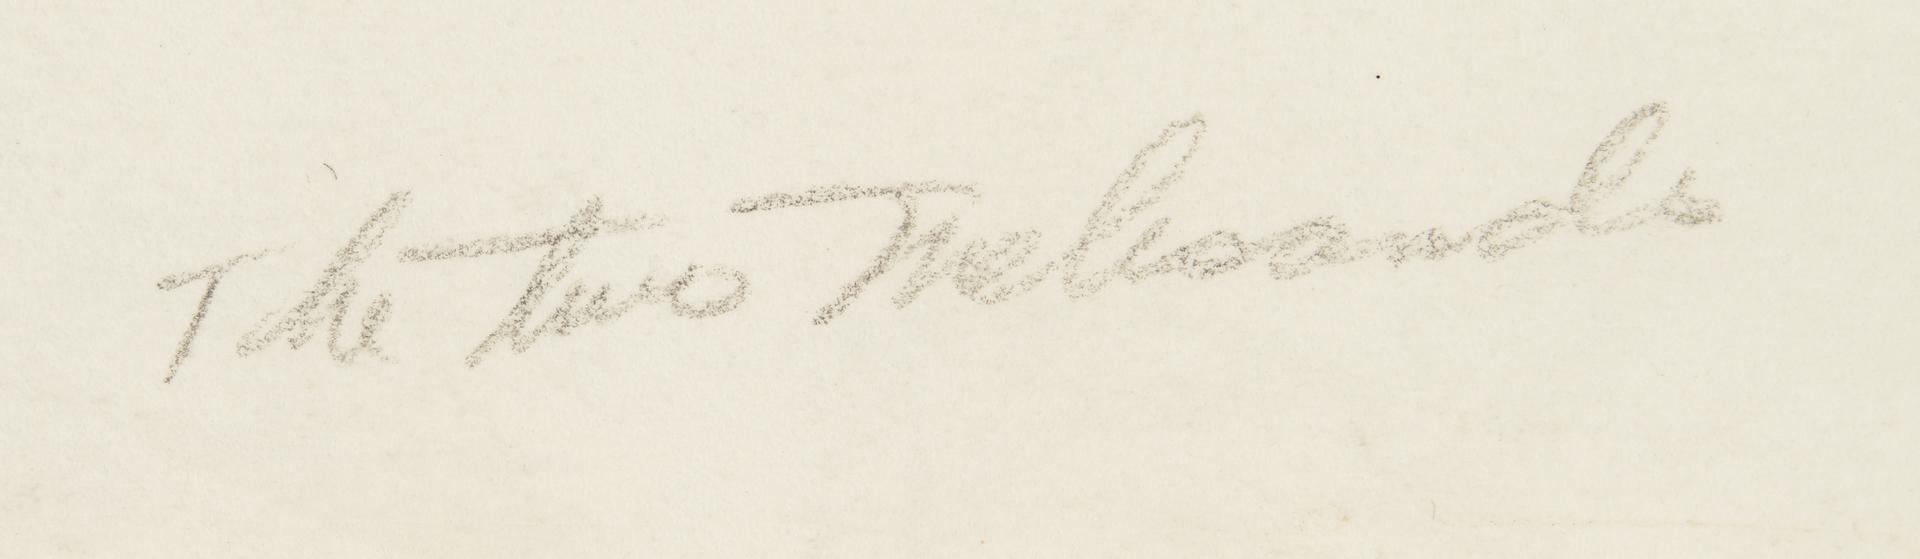 Lot 815: 4 Gerald Brockhurst Etchings, Elizabeth, Trial